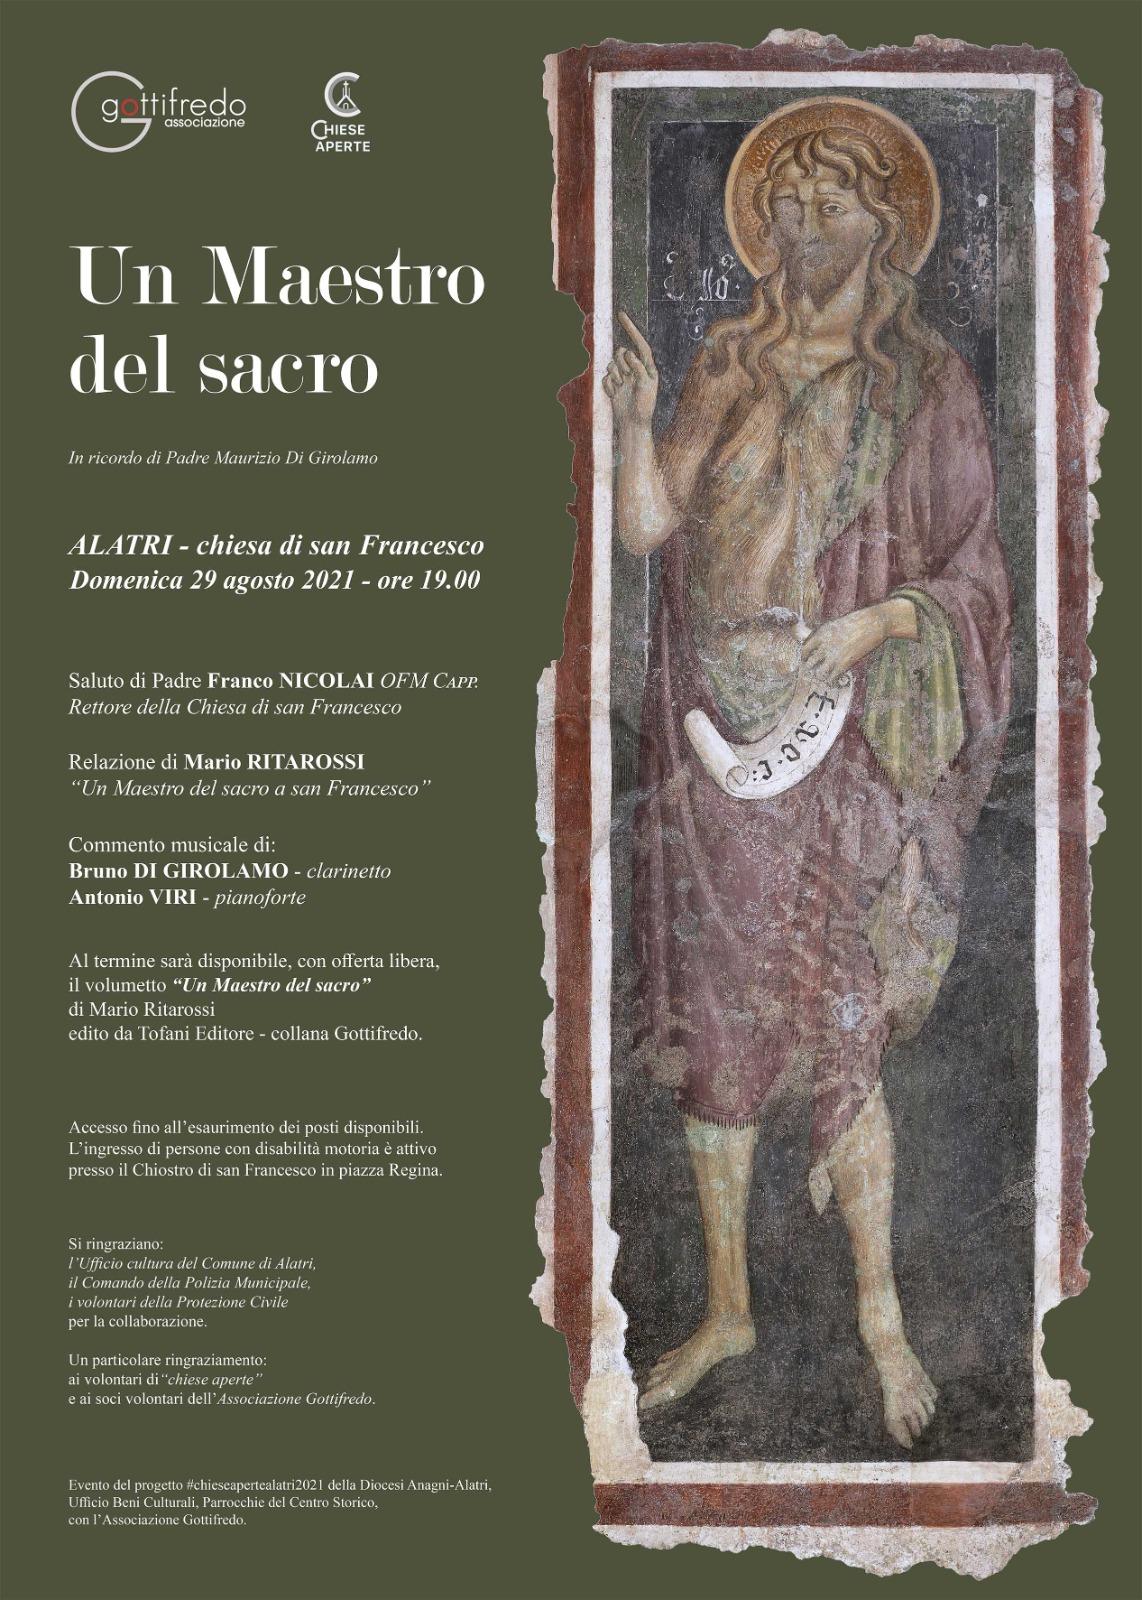 Un Maestro del Sacro. Appuntamento a San Francesco, domenica 29 agosto